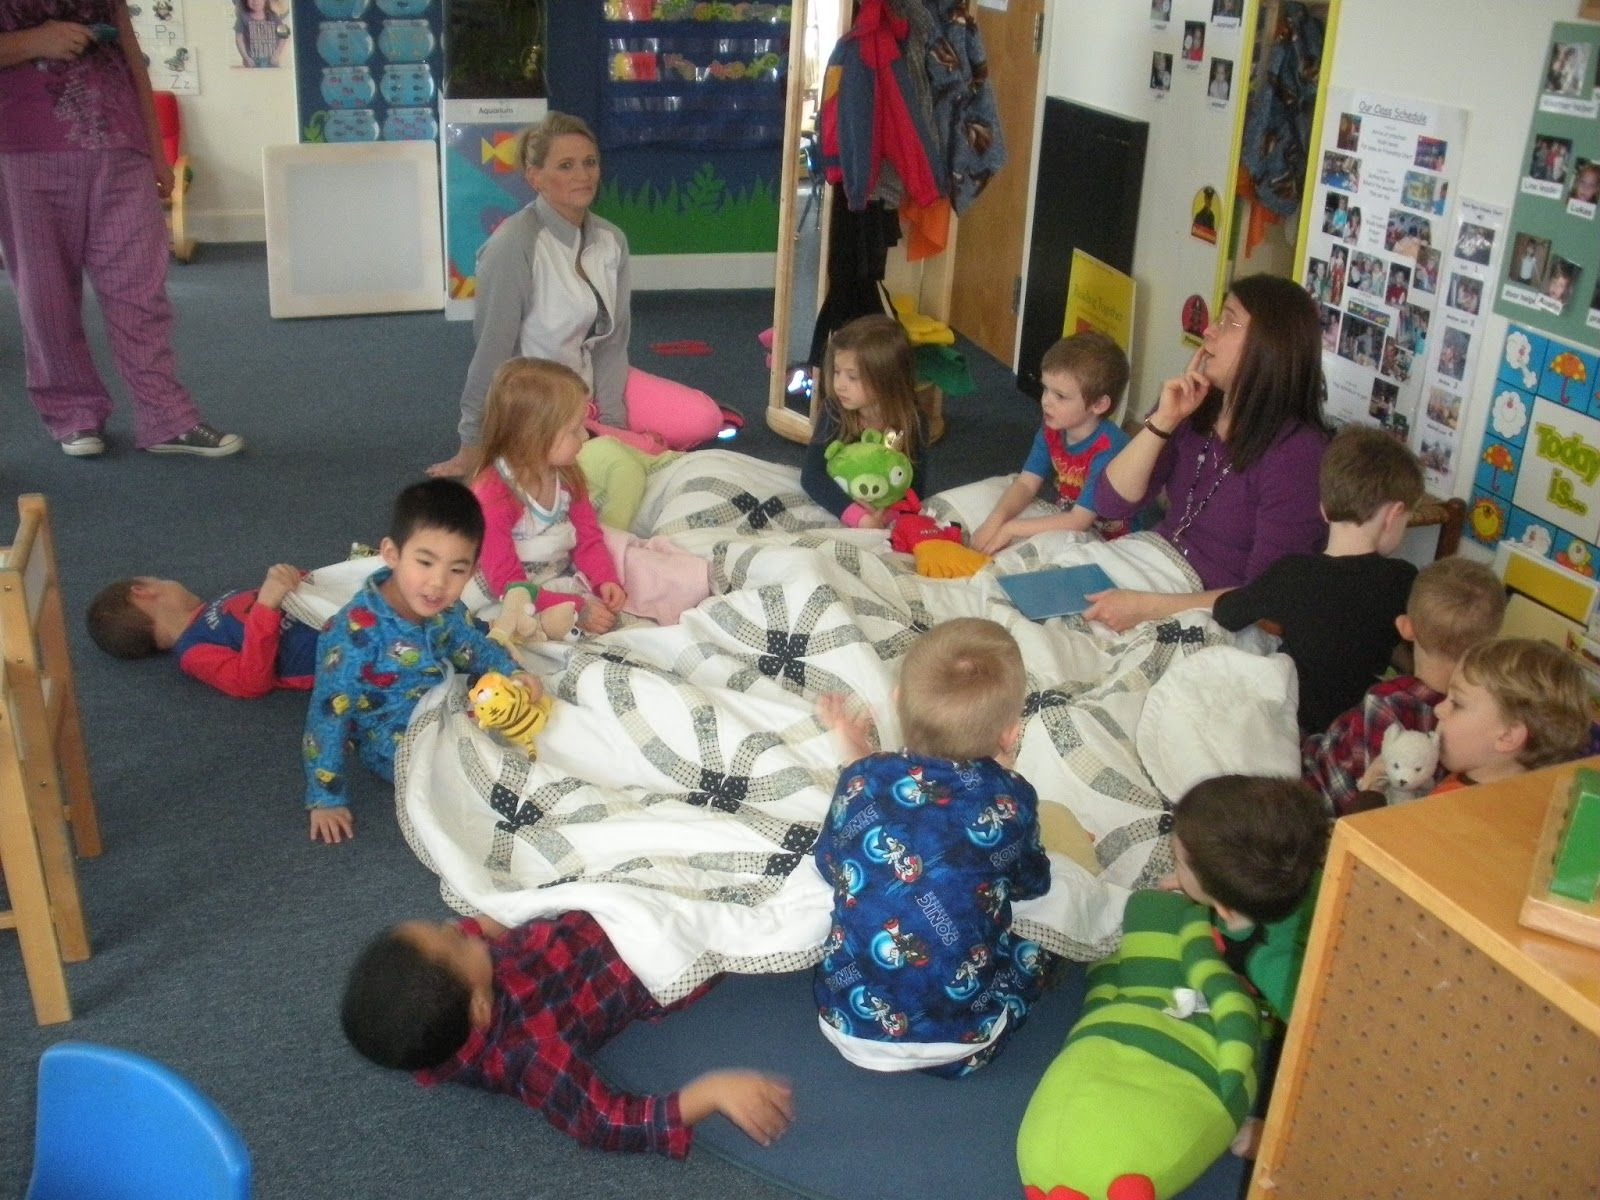 Tlc Pajama Day Activities